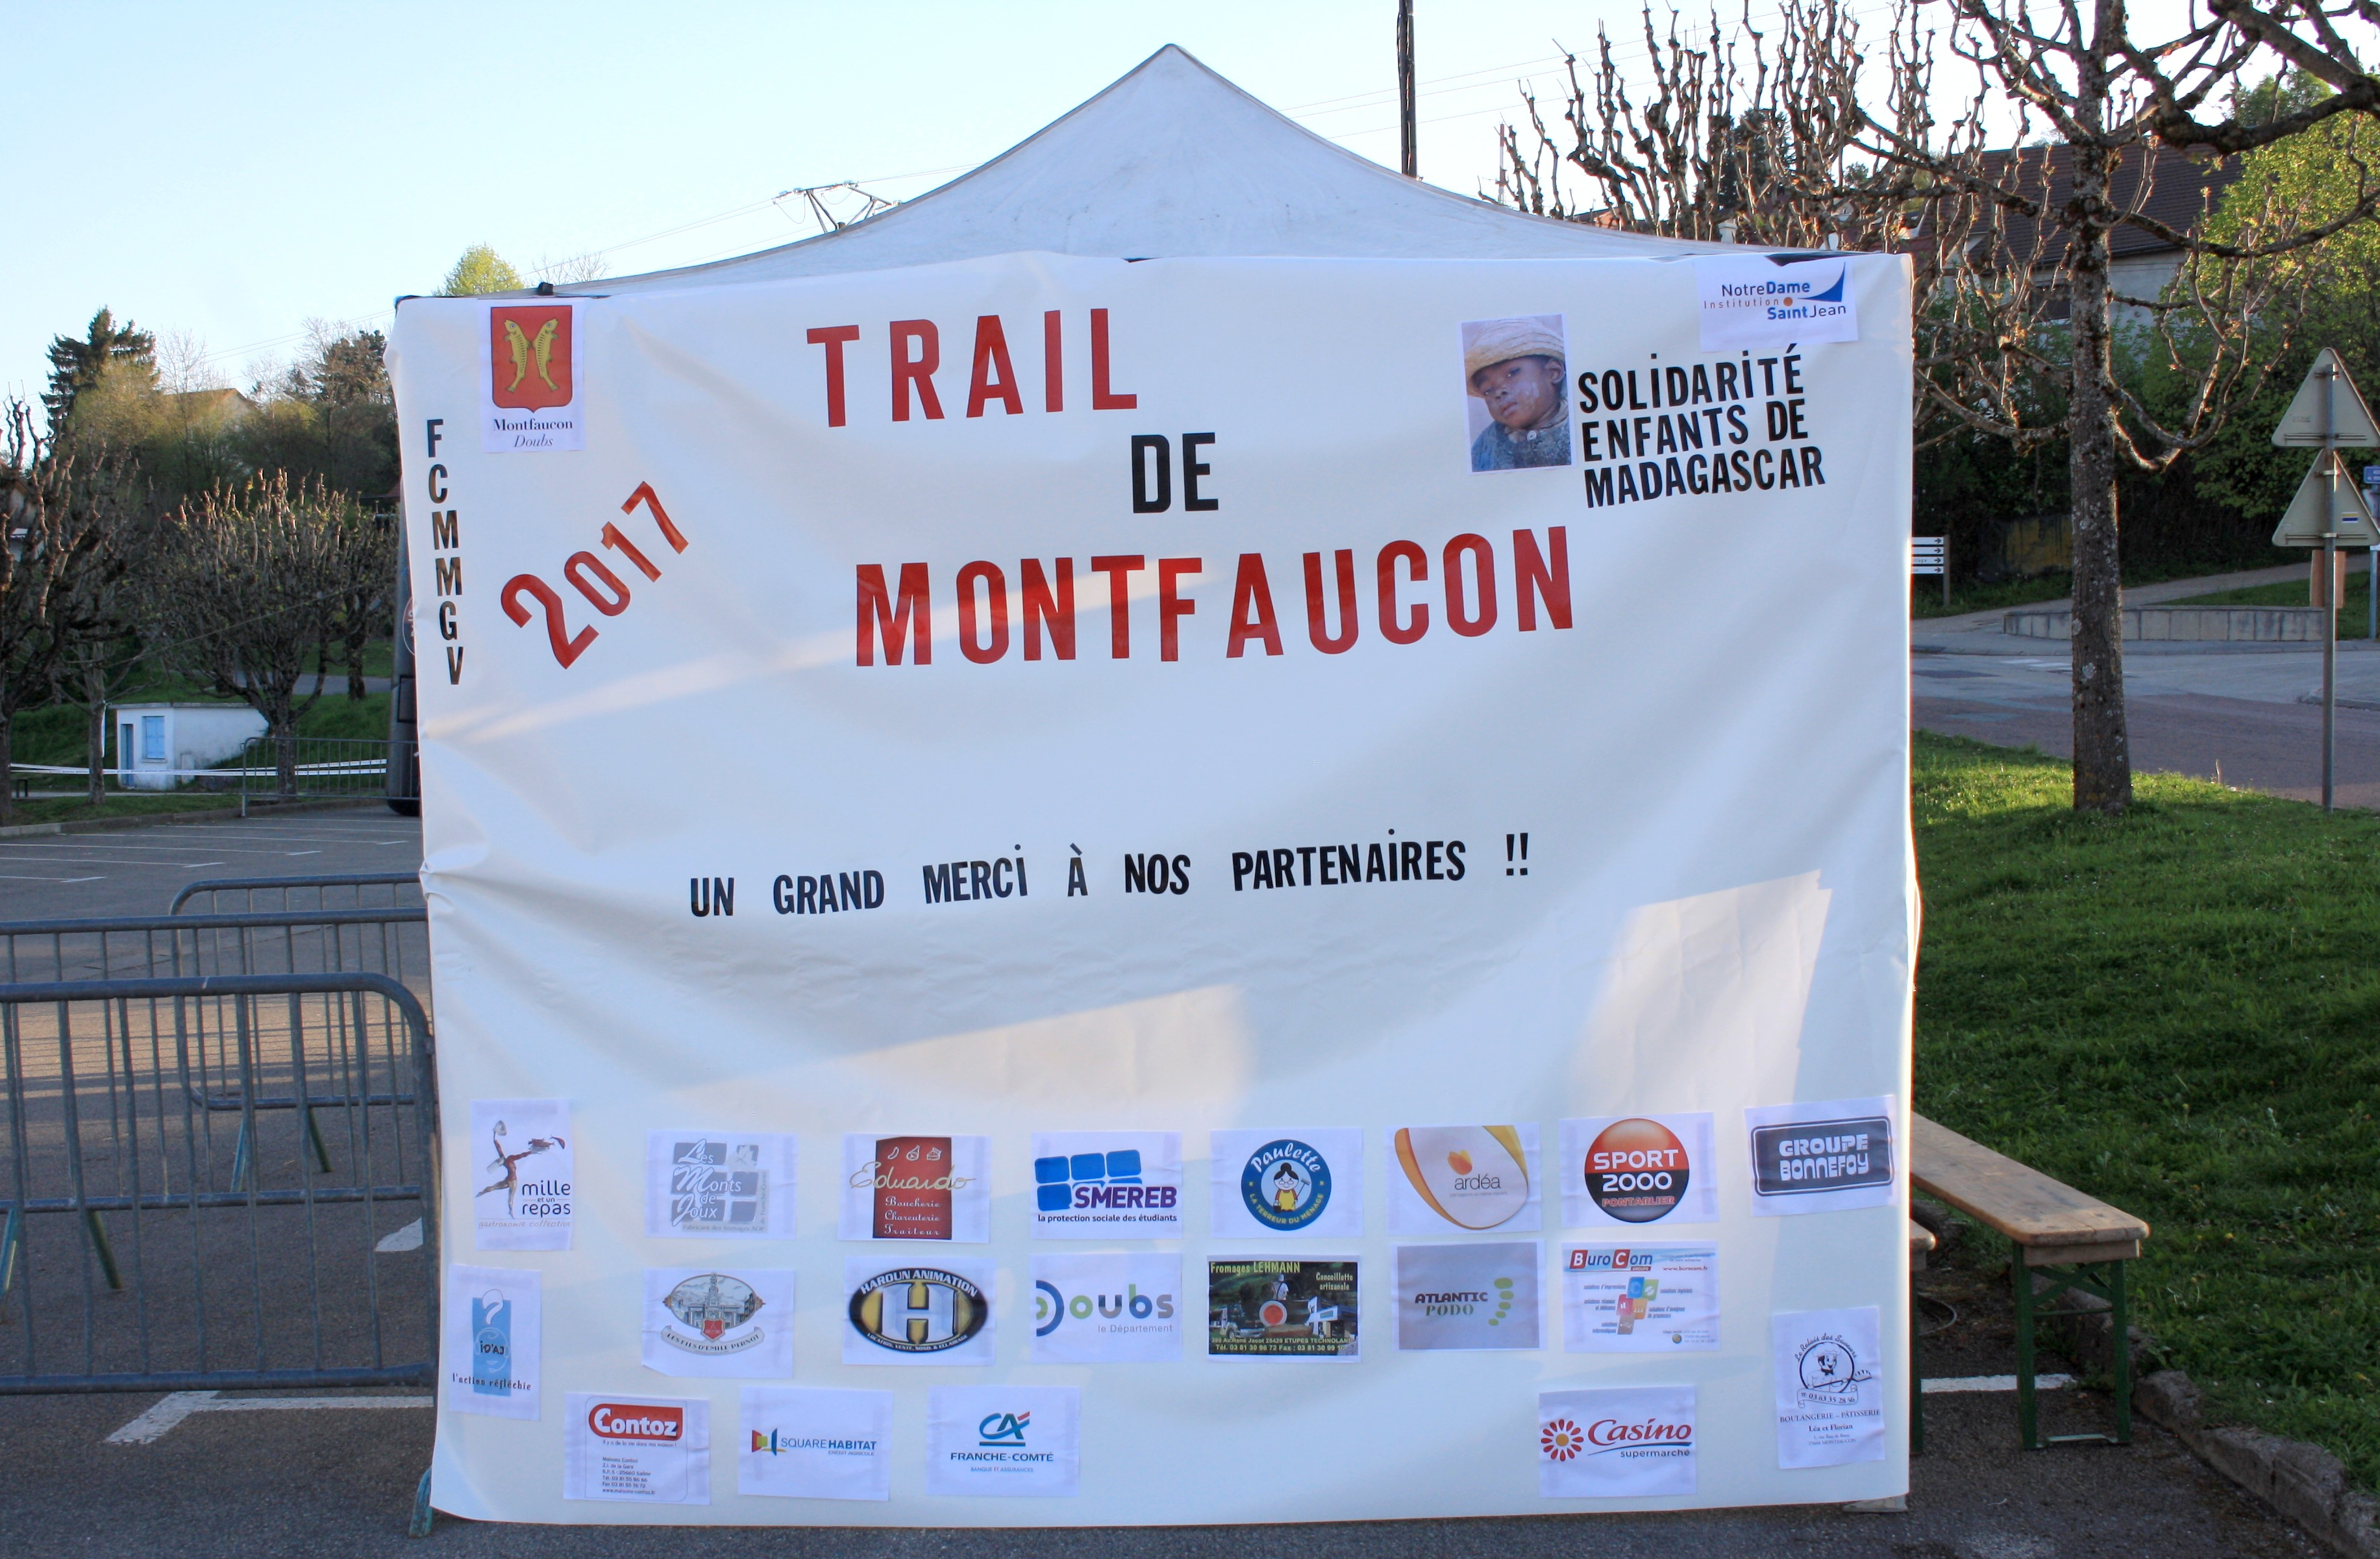 2017-04-09 - Trail-Montfaucon (28)